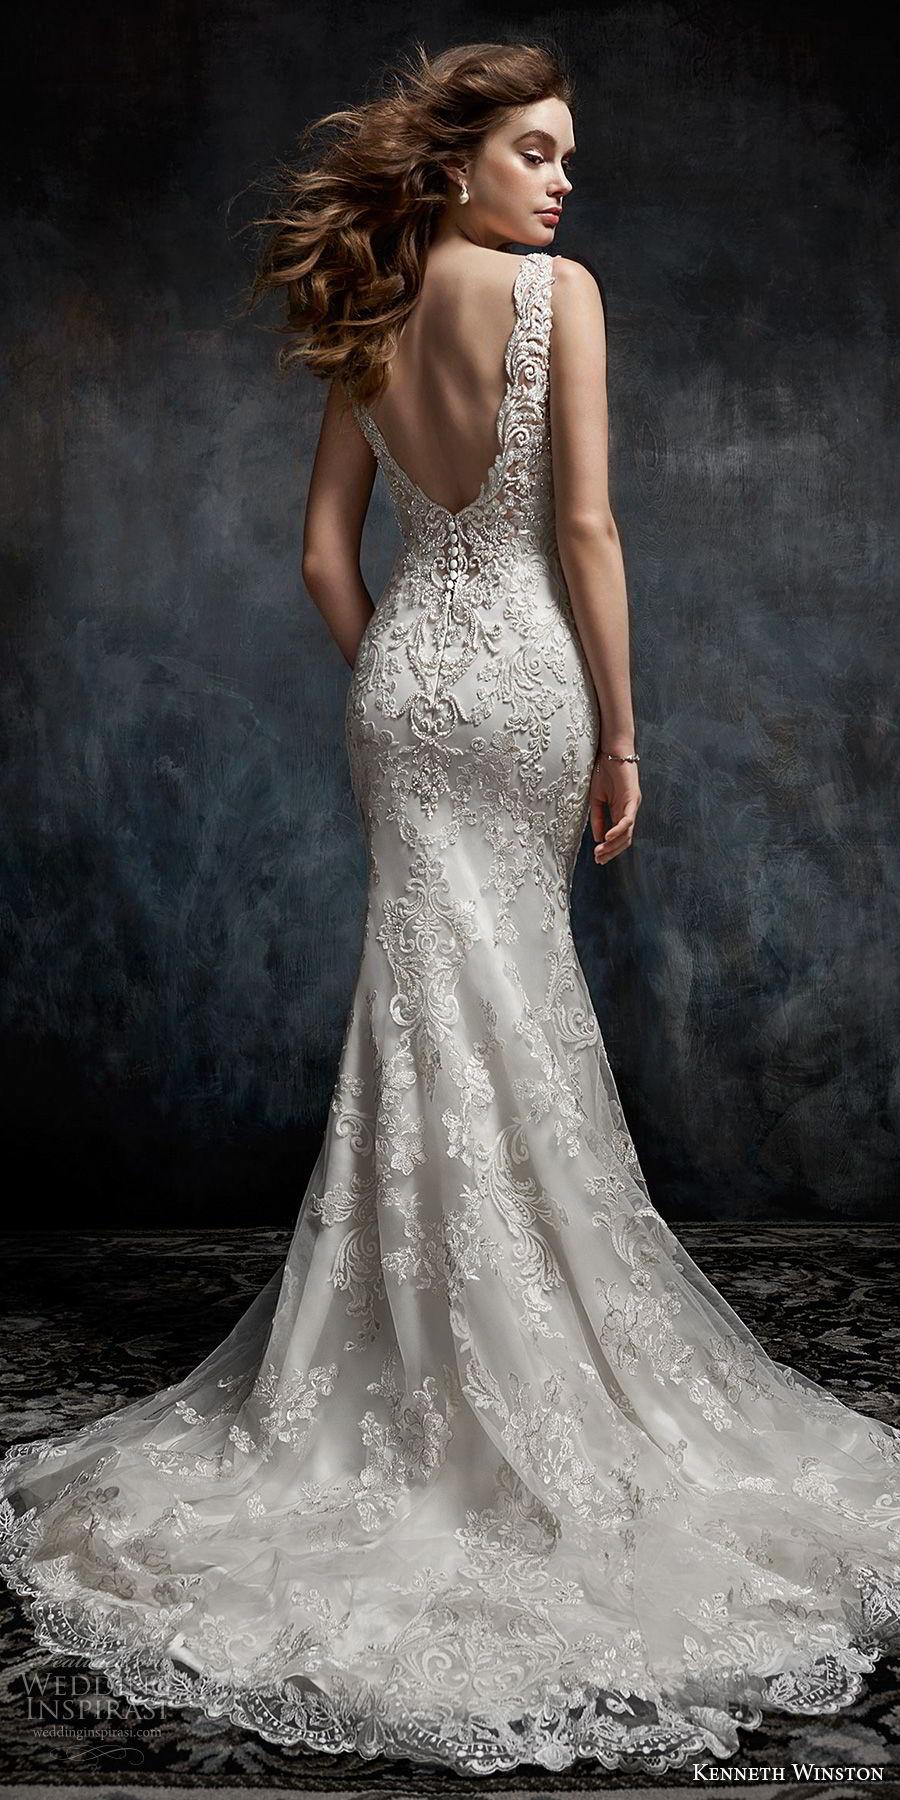 kenneth winston fall 2017 bridal sleeveless bateau neckline full embellishment elegant fit and flare sheath wedding dress open back medium train (30) bv